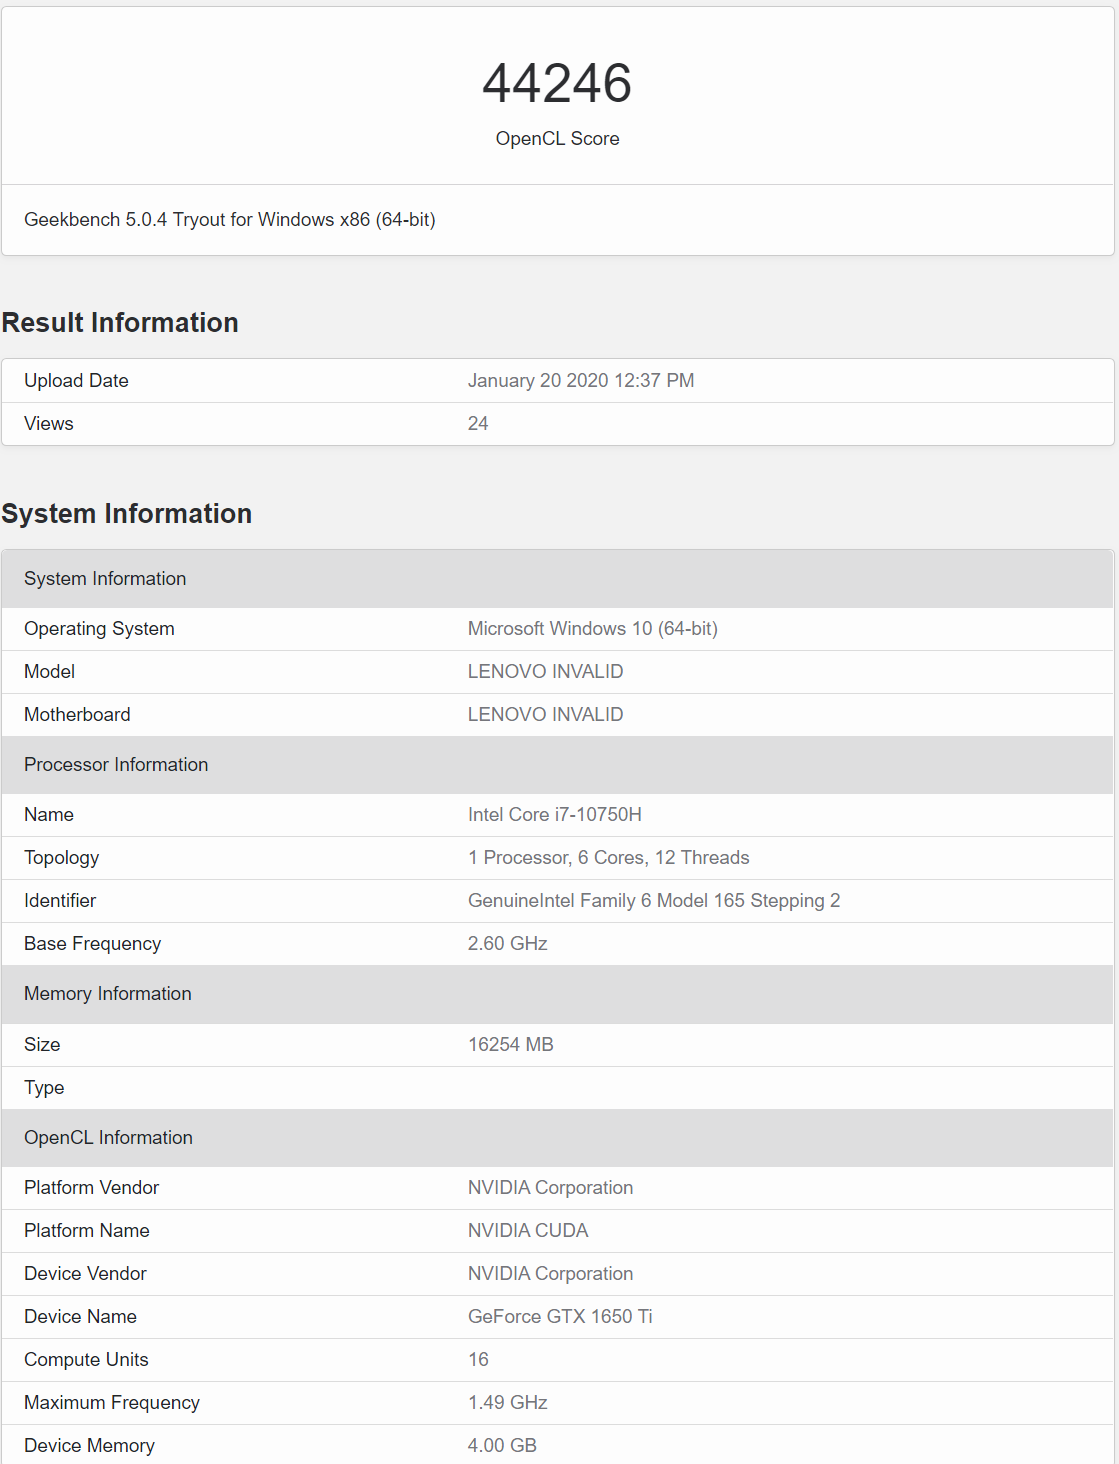 nvidia-geforce-gtx-1650-ti-notebook-gpu-specs-and-performance_2